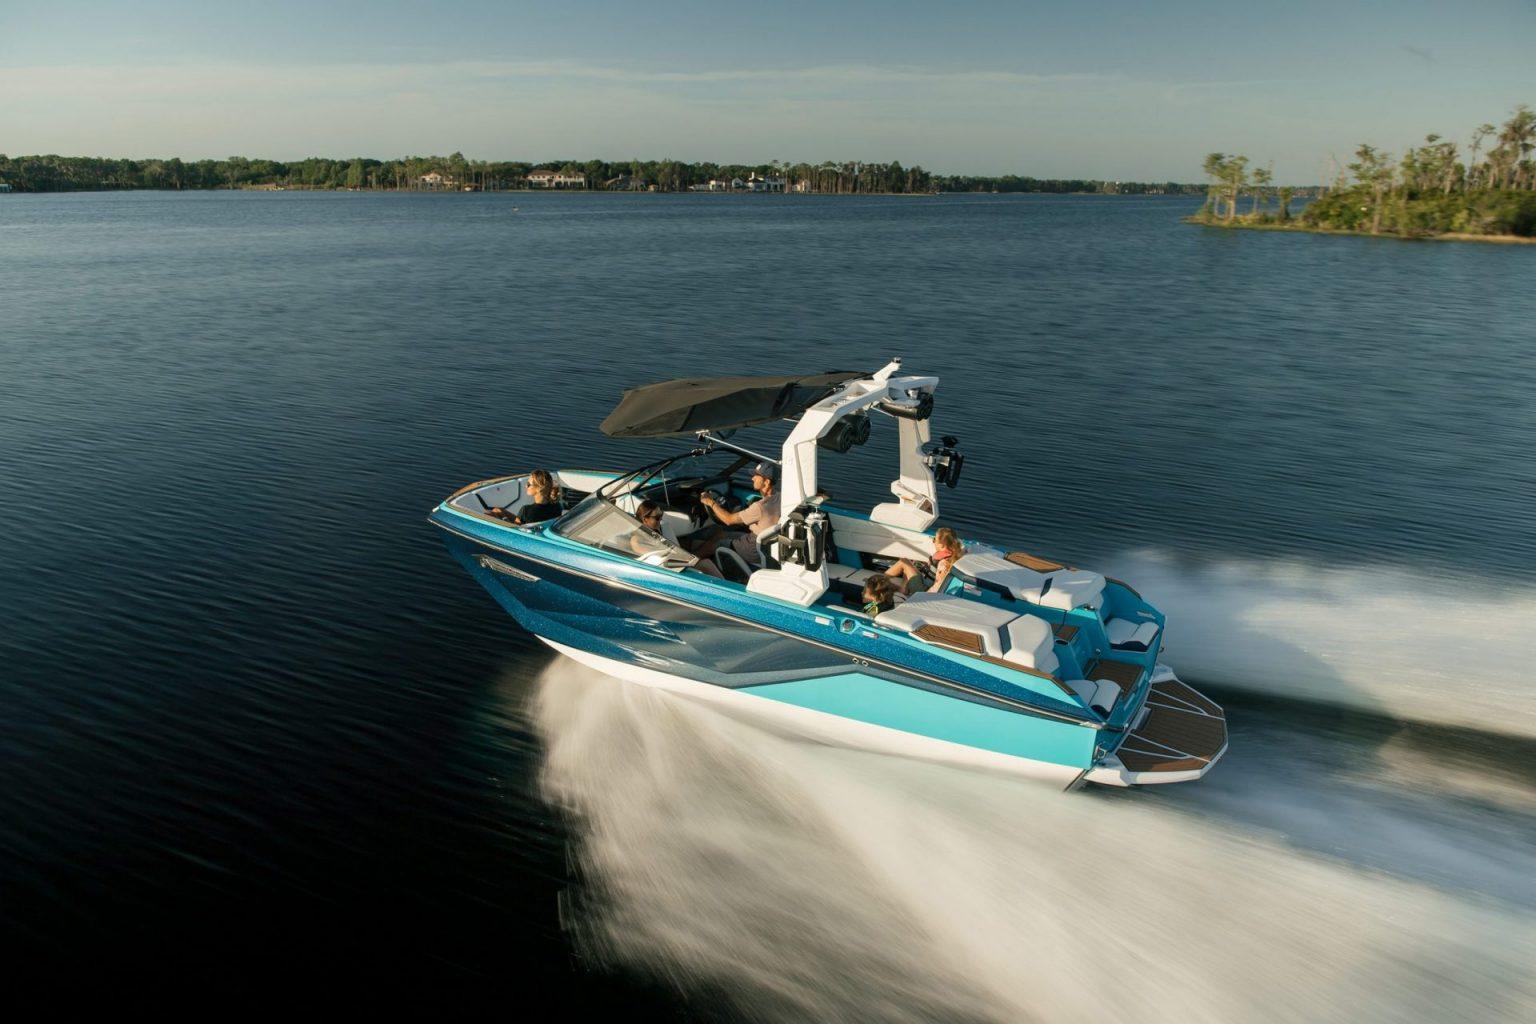 סירת ספורט וויקסרף וויקבורד NAUTIQUE G21 - סטרים יאכטות